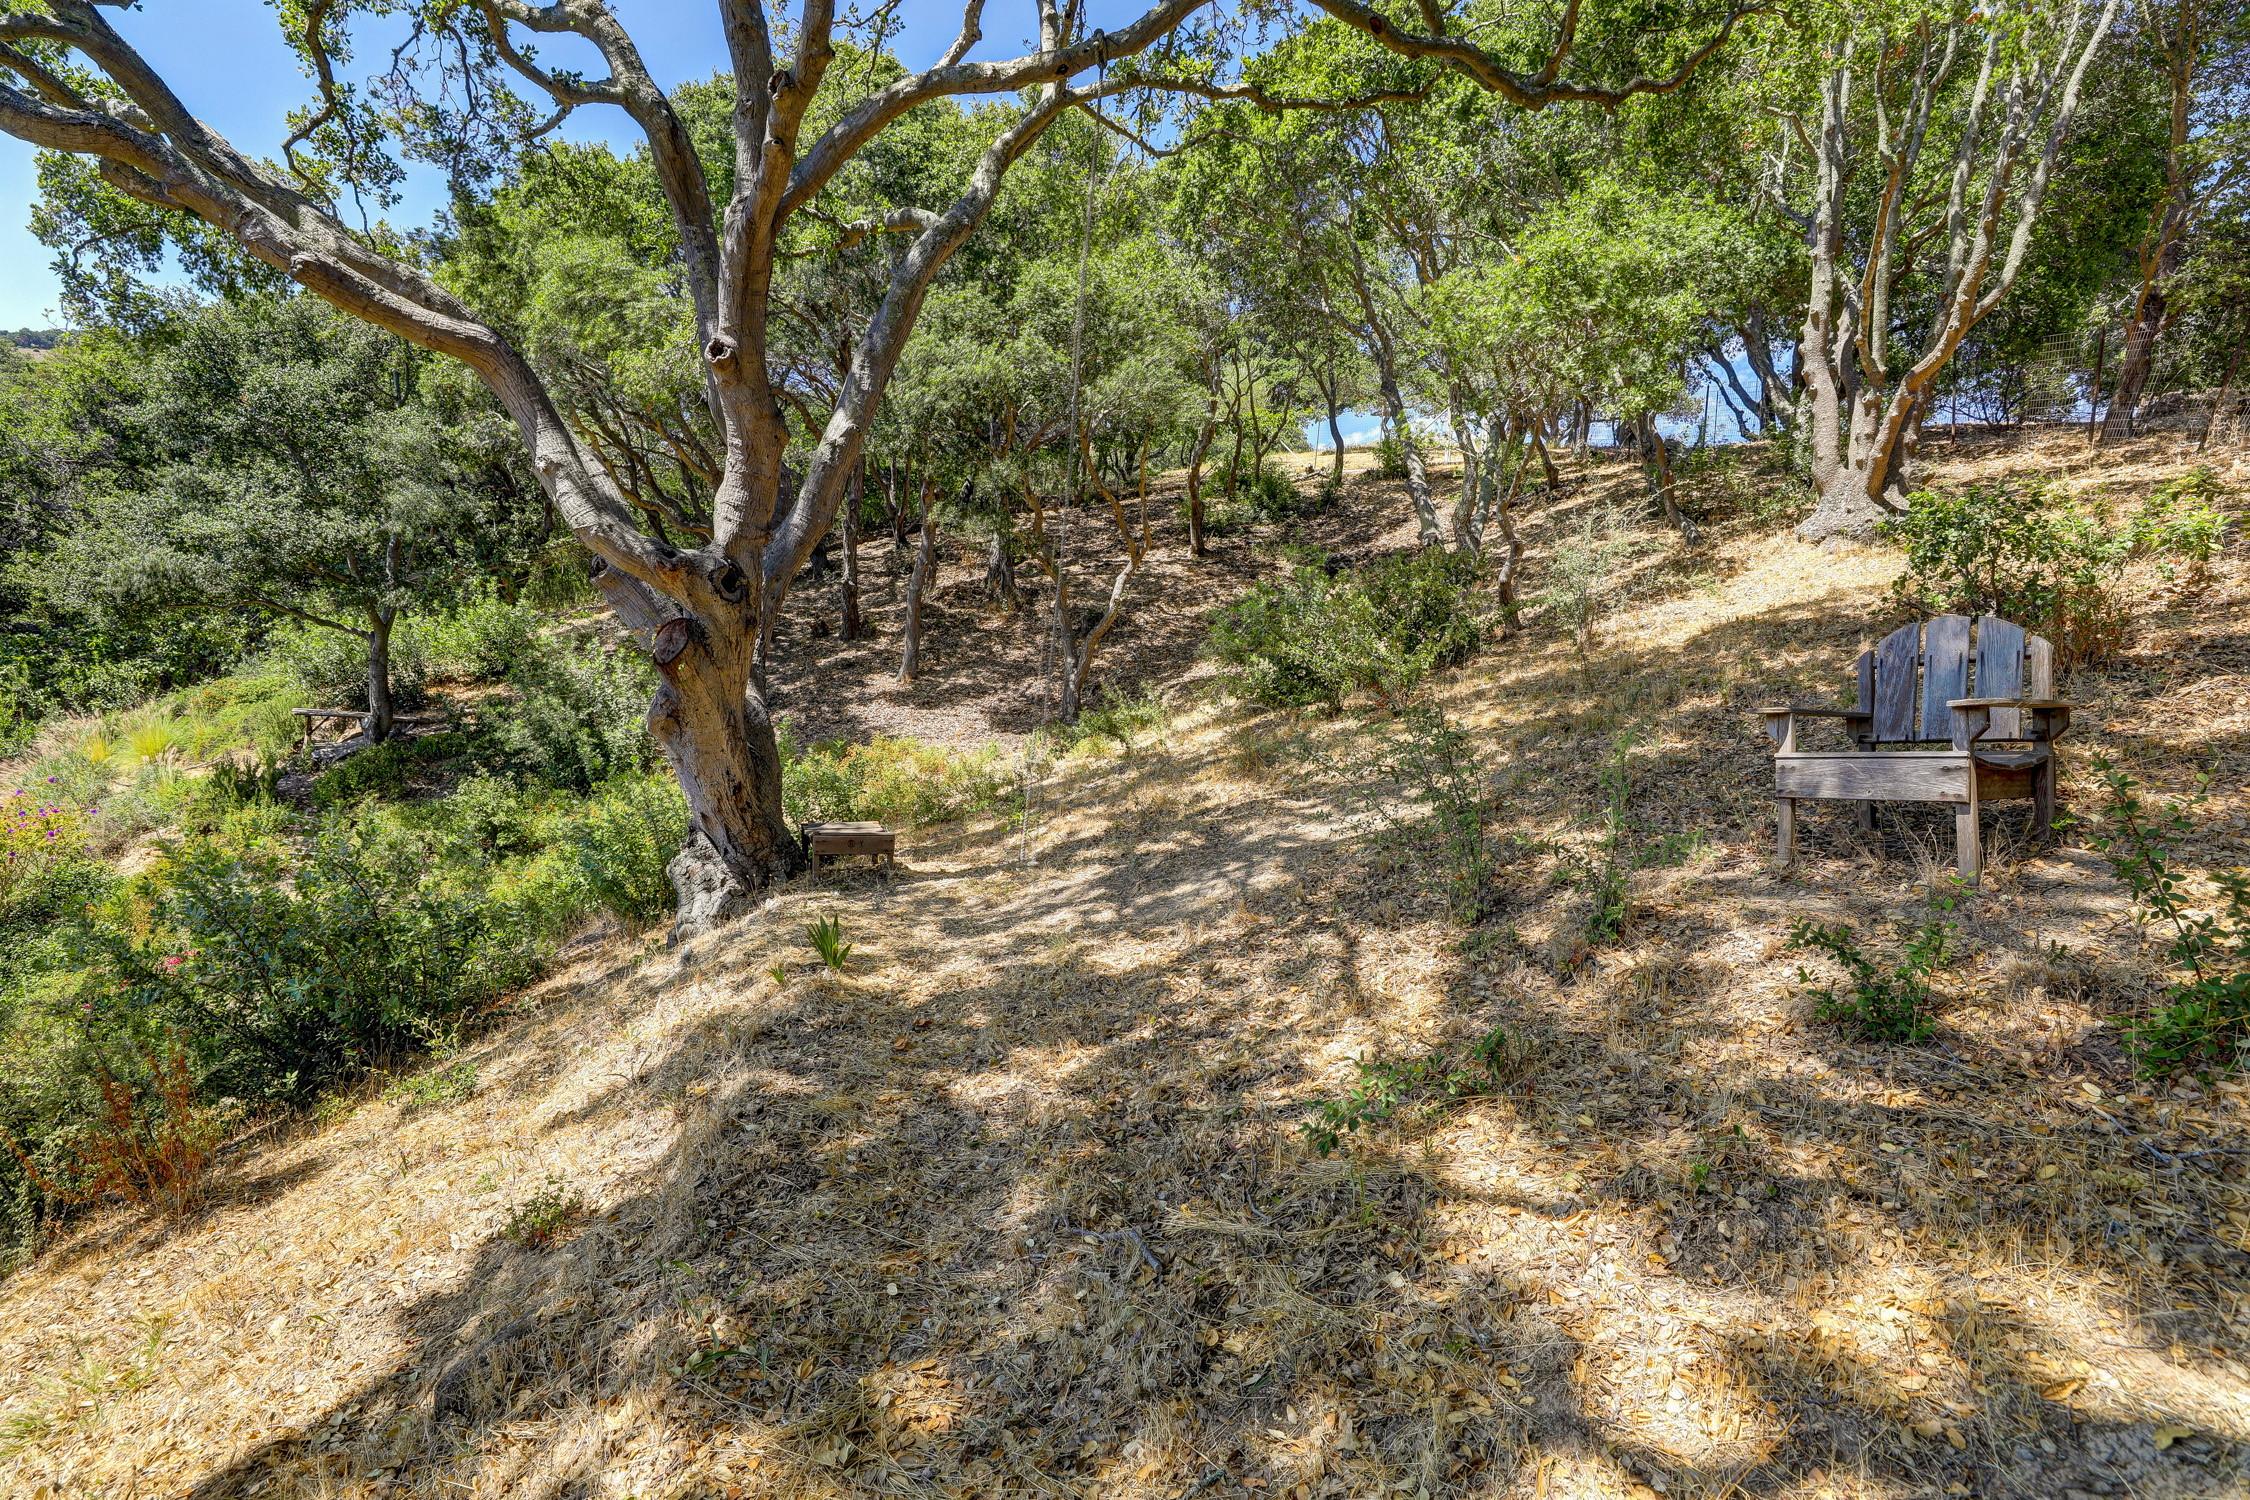 16Dorian 80 MLSSan Rafael Real Estate - Listed by Julia Fitzpatrick + Allie Fornesi Team Own Marin County .jpg